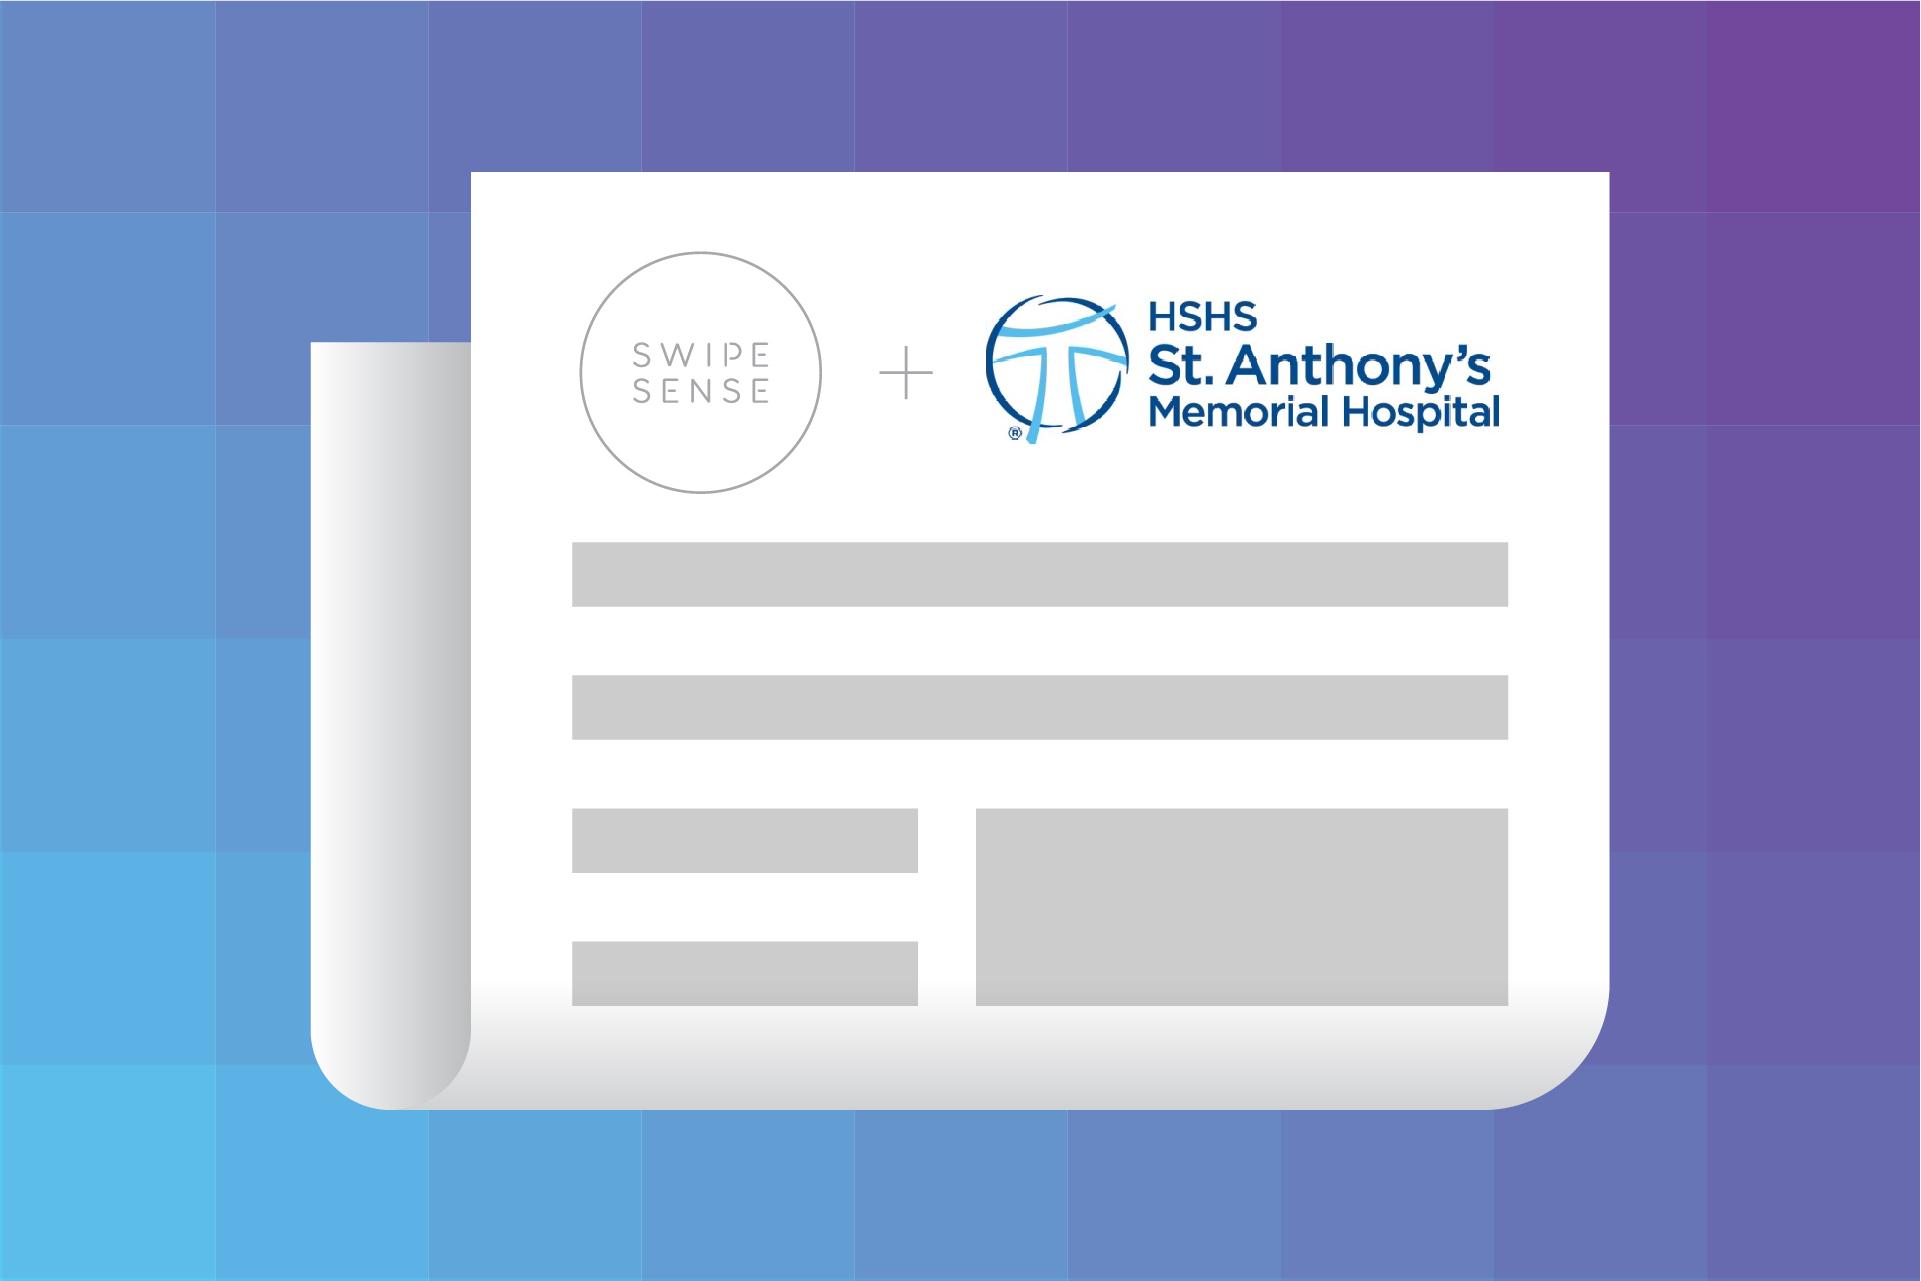 News: HSHS St. Anthony's Memorial Hospital Launches SwipeSense